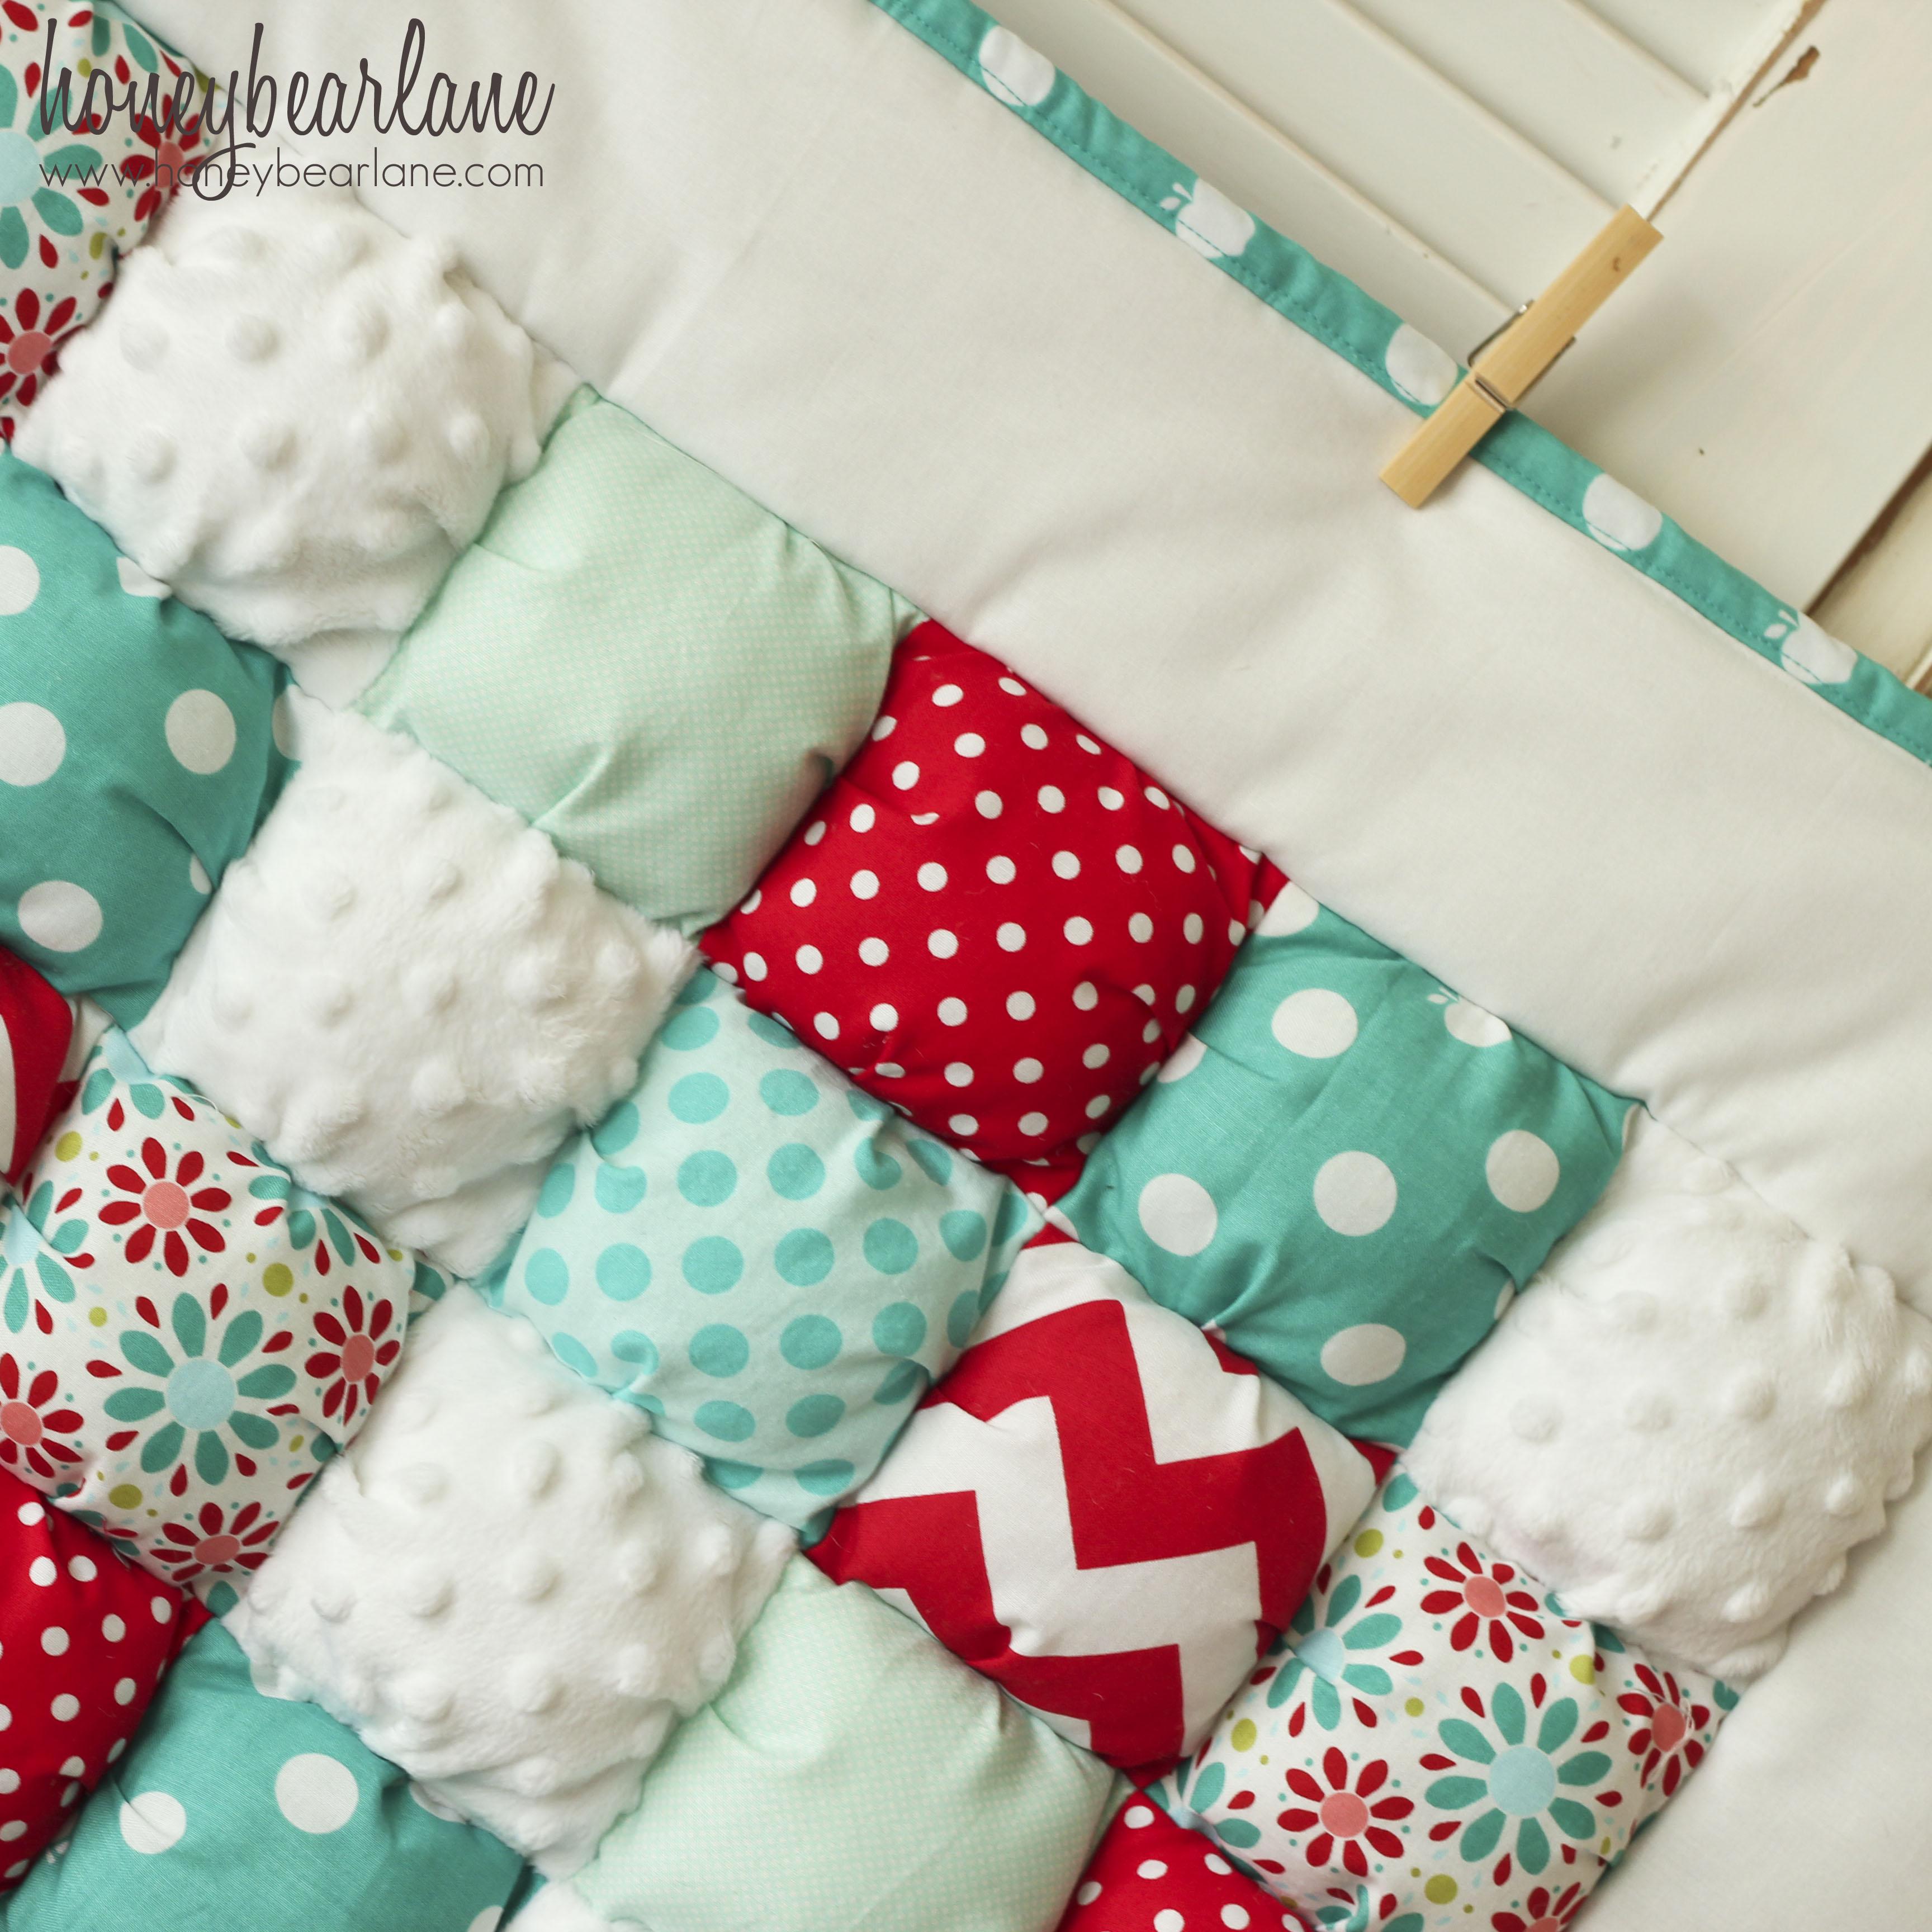 Puff Quilts : puff baby quilt - Adamdwight.com